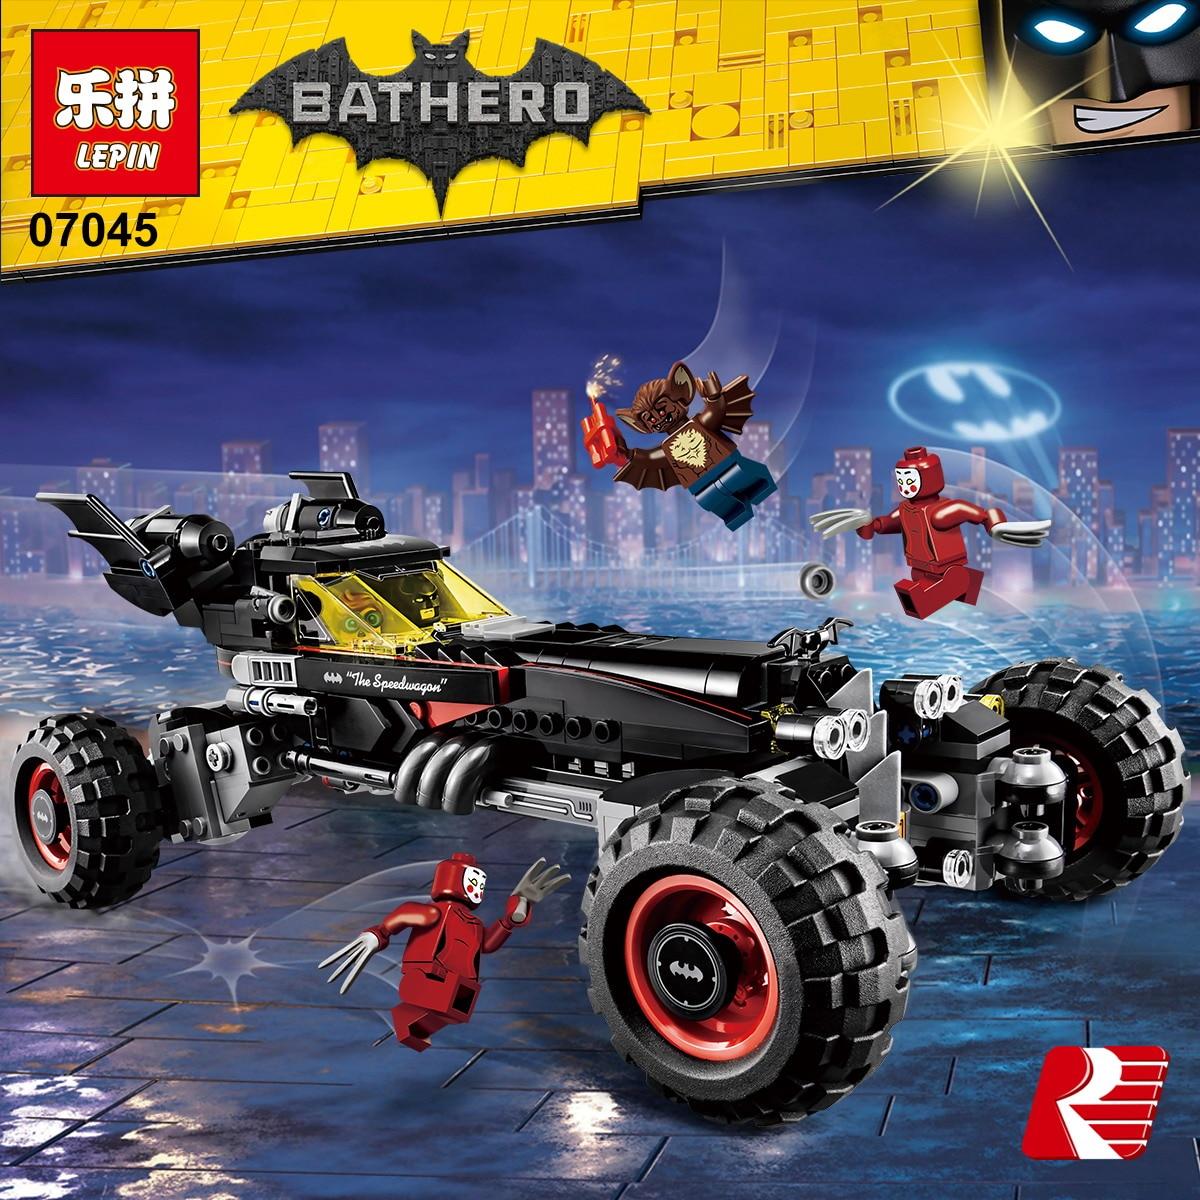 Batman Set 559pcs The Batmobile Superhero Building Blocks Lepin 07045